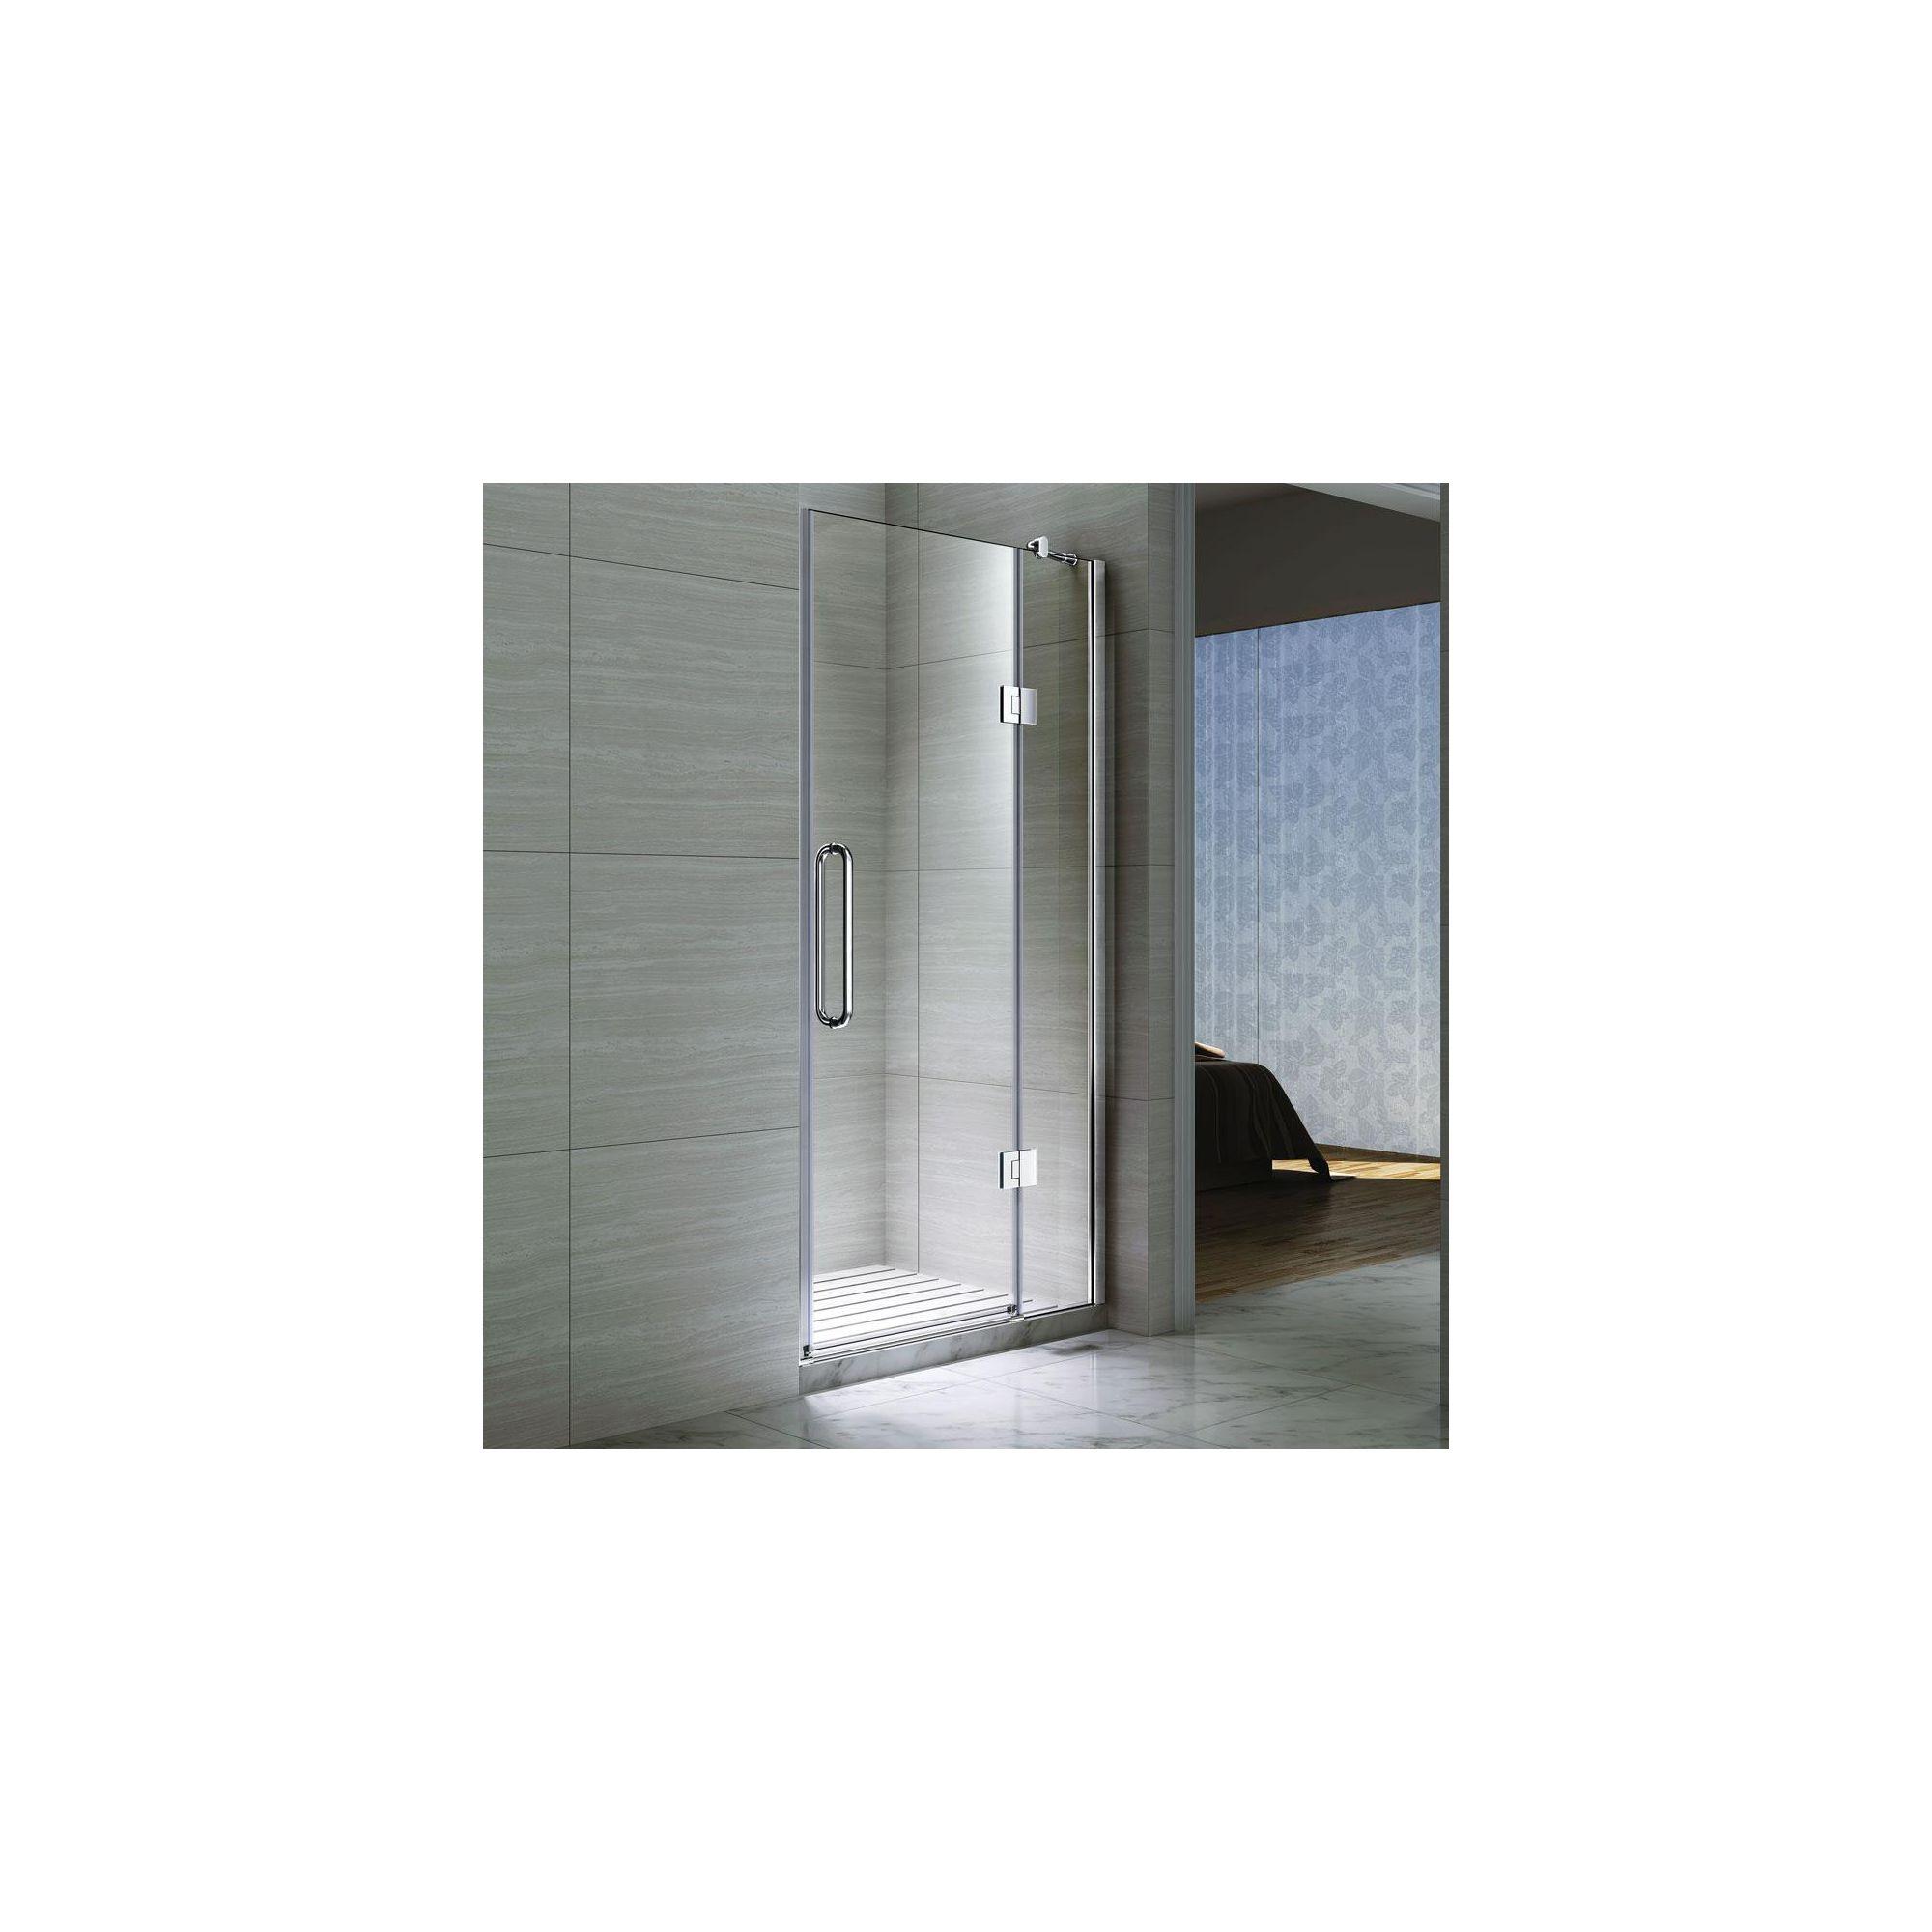 Desire Ten Inline Hinged Shower Door, 800mm Wide, Semi-Frameless, 10mm Glass at Tesco Direct